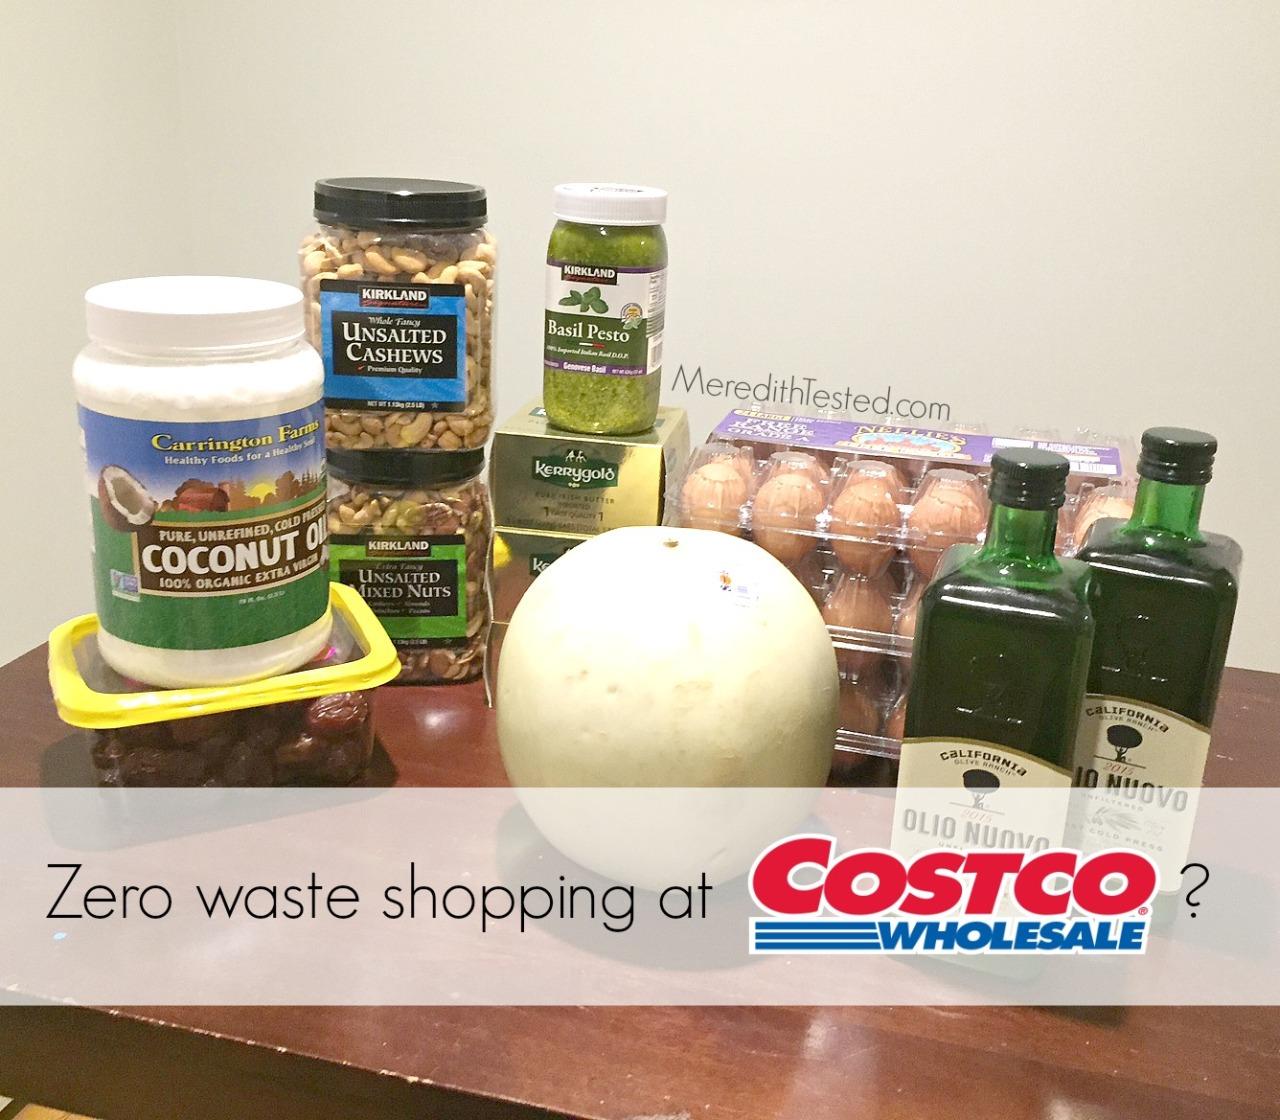 Shopping in bulk, zero waste at Costco